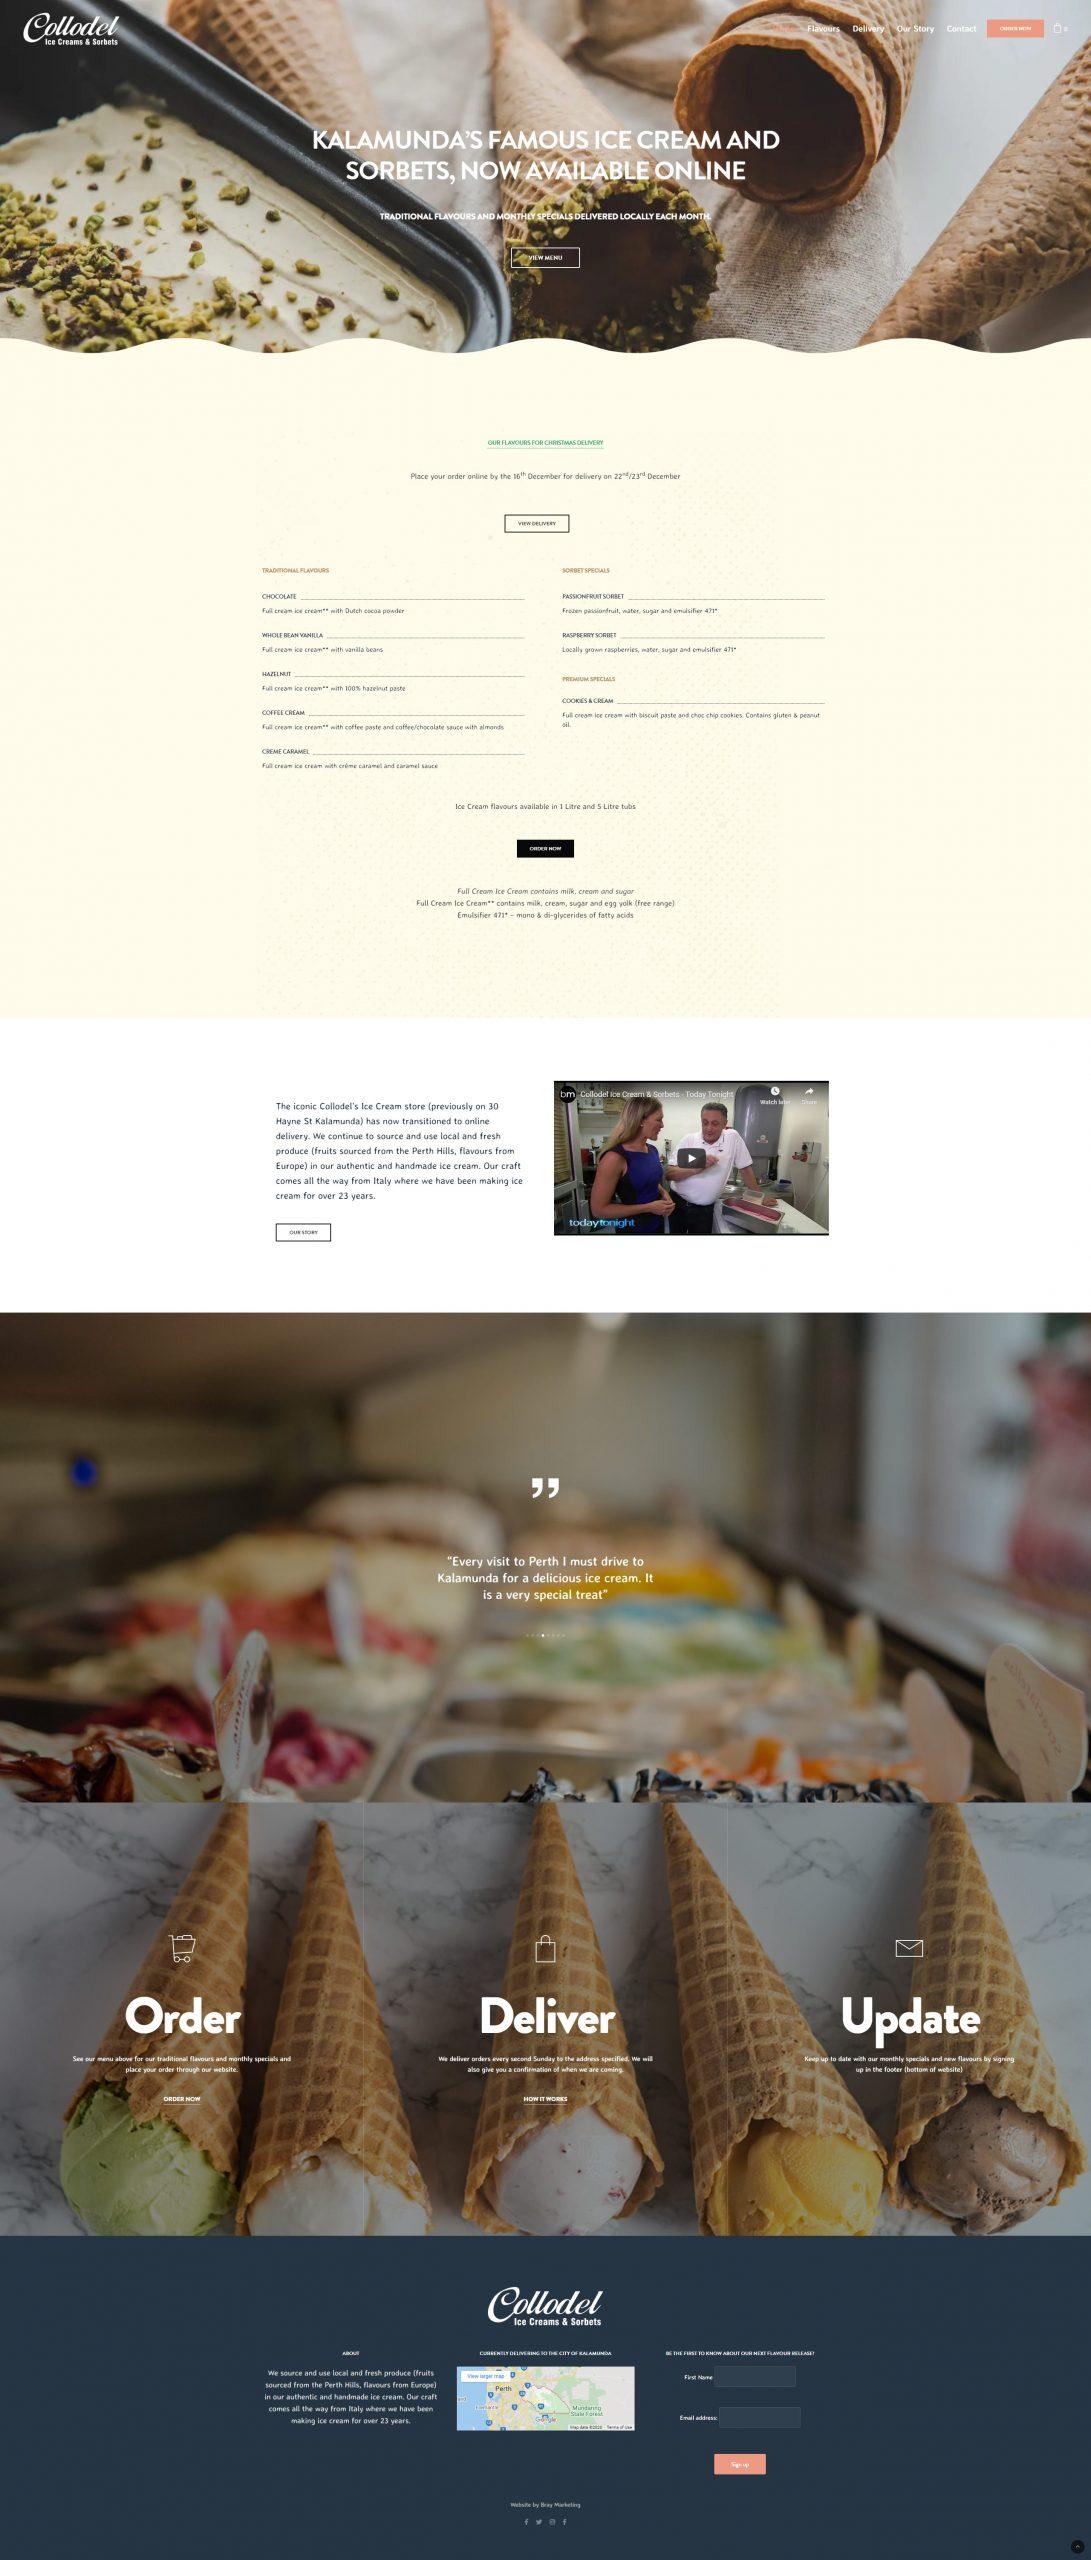 Collodel Ice Cream Sorbets - Kalamunda Perth - Bray Marketing Website